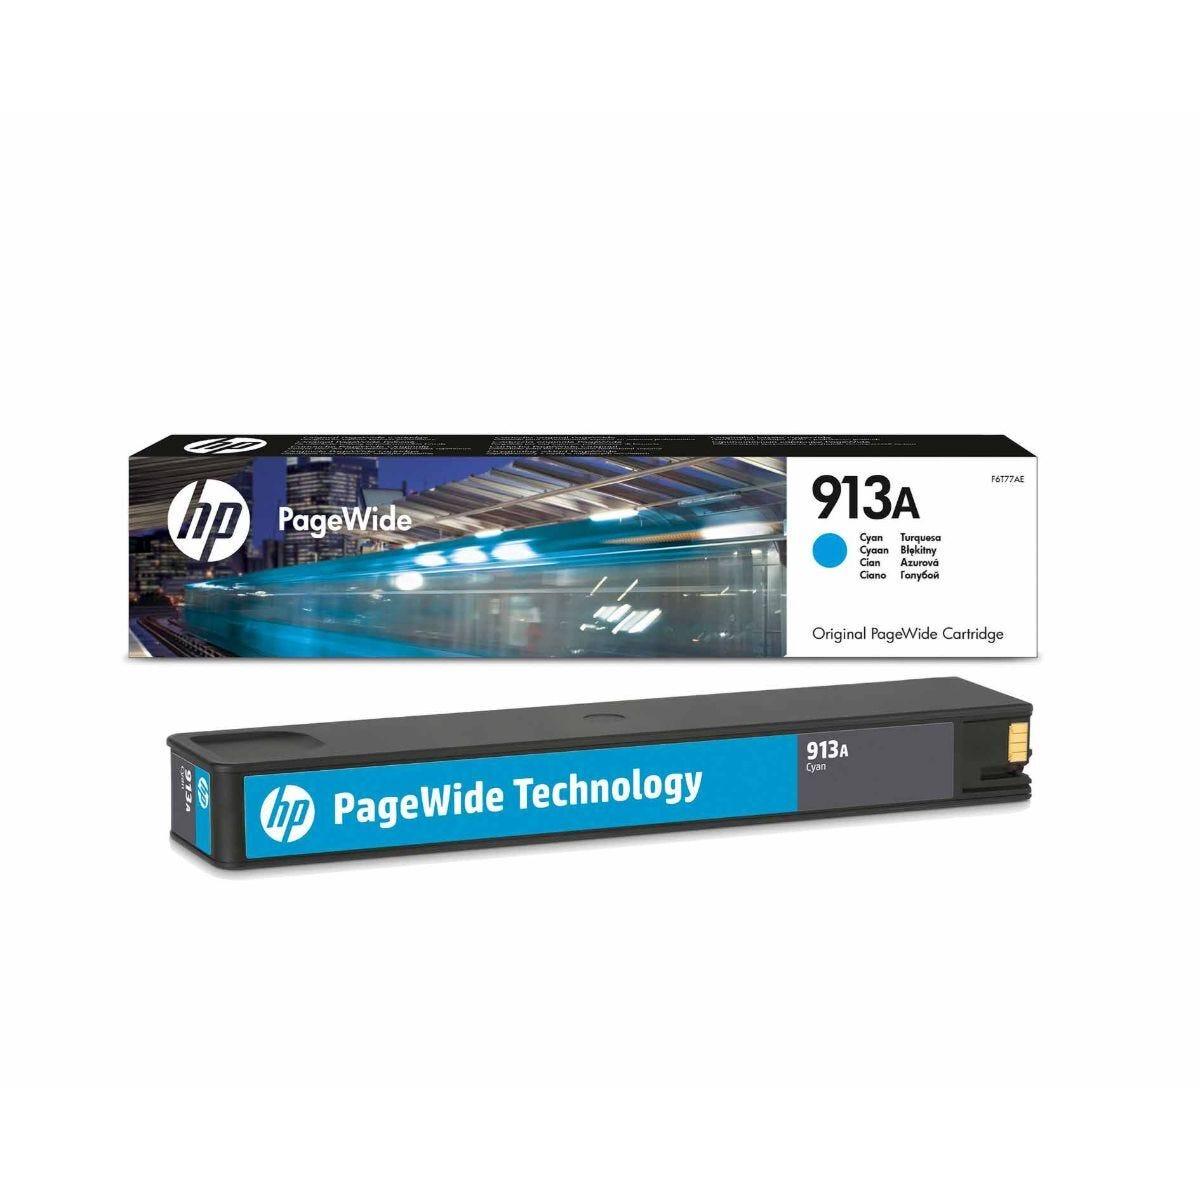 HP 913A Cyan Original Ink Cartridge